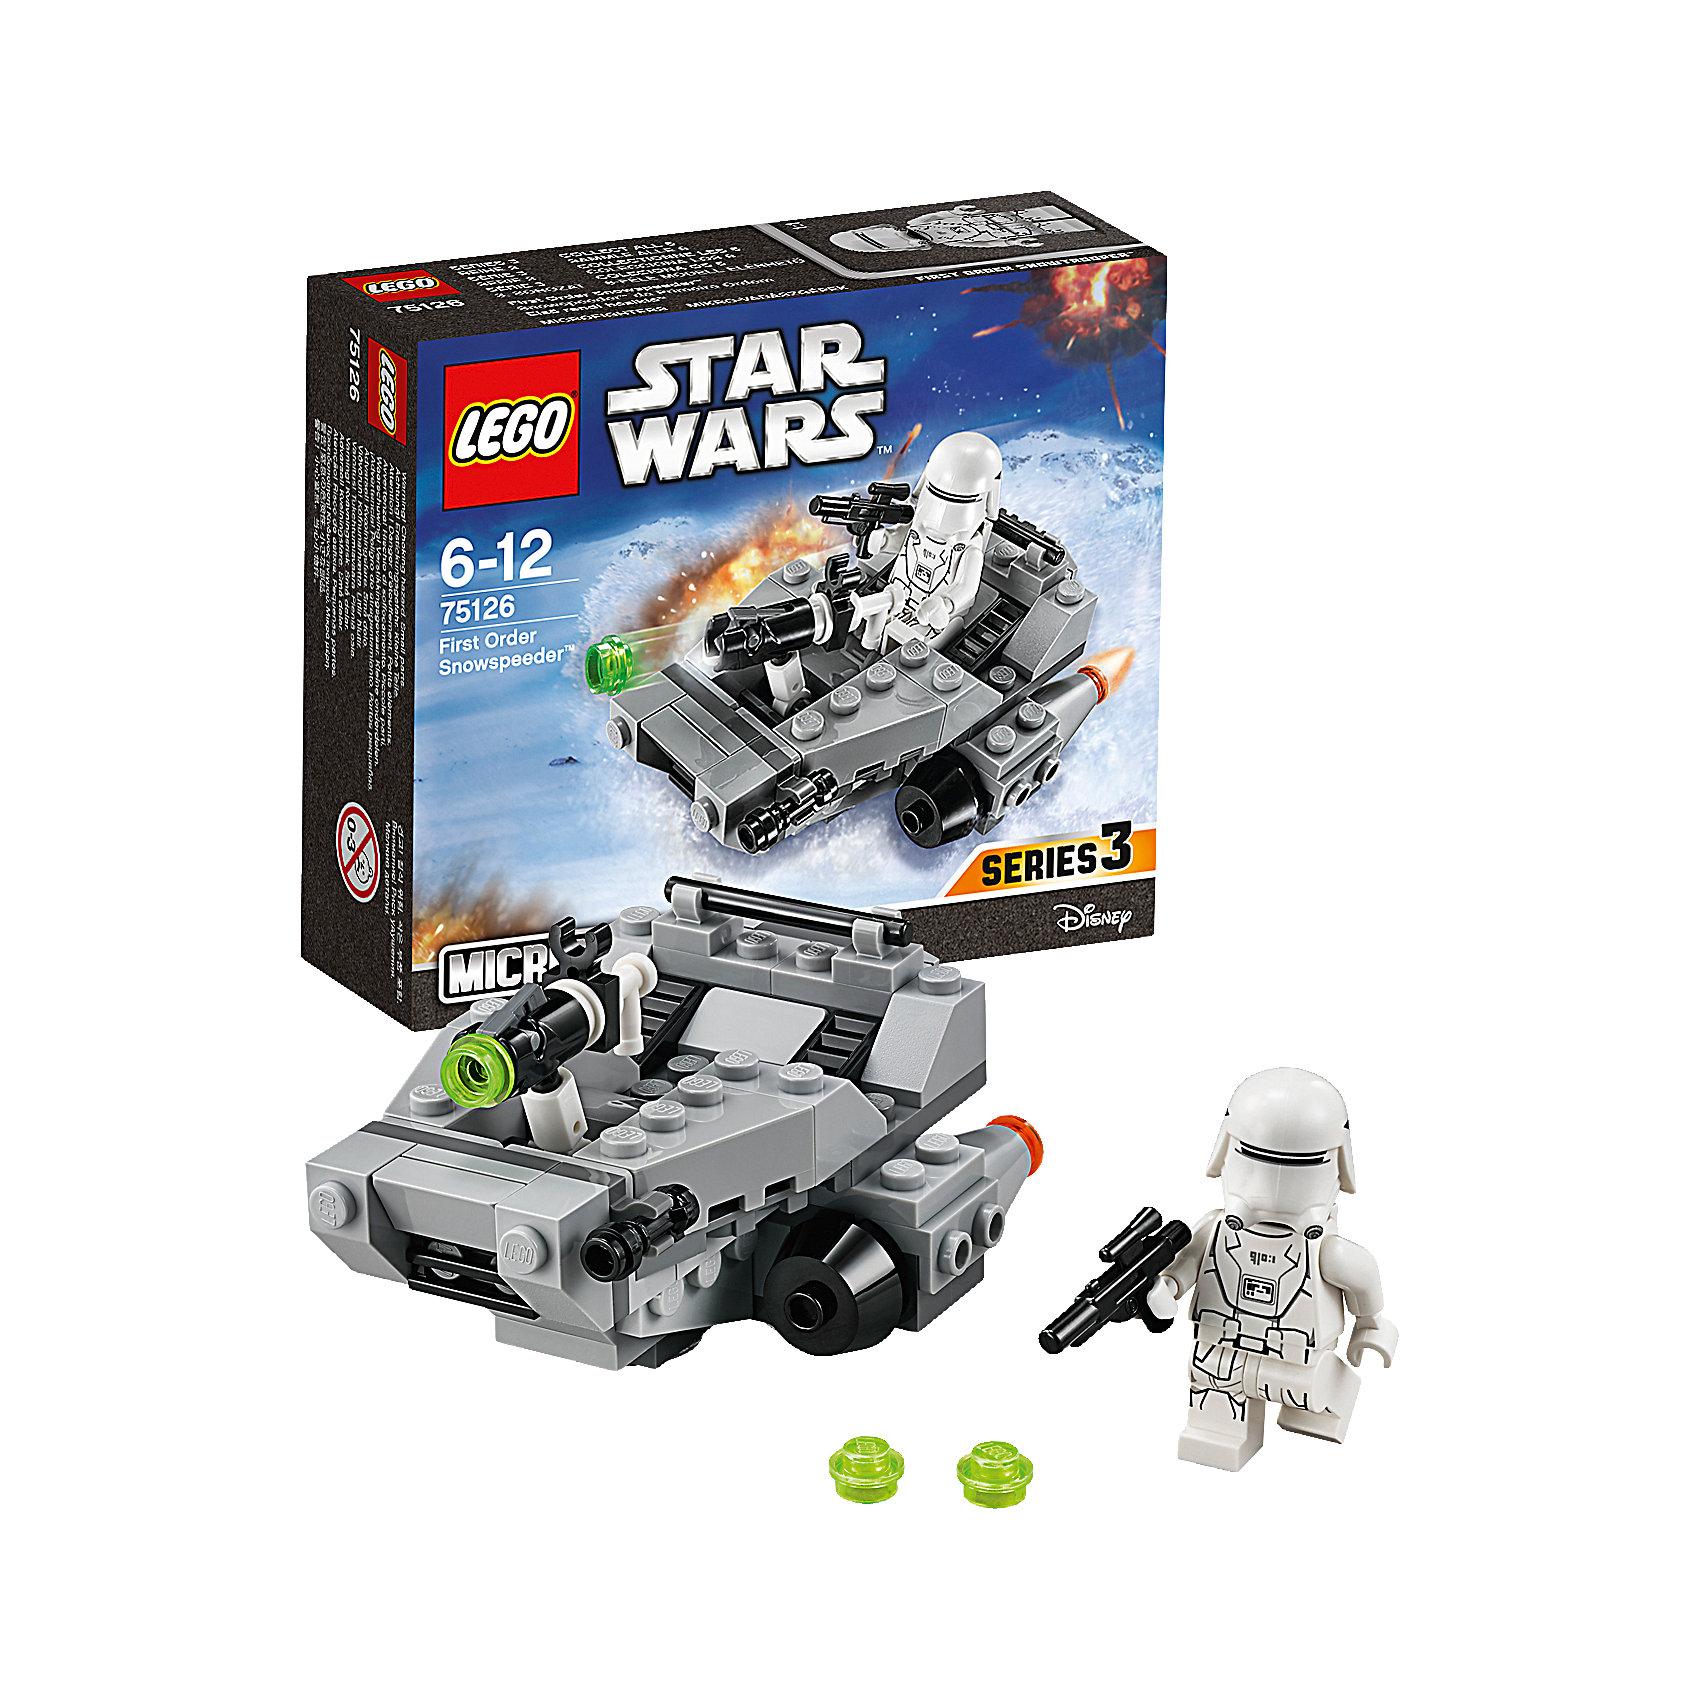 LEGO LEGO Star Wars 75126: Снежный спидер Первого Ордена lego lego star wars снежный спидер первого ордена